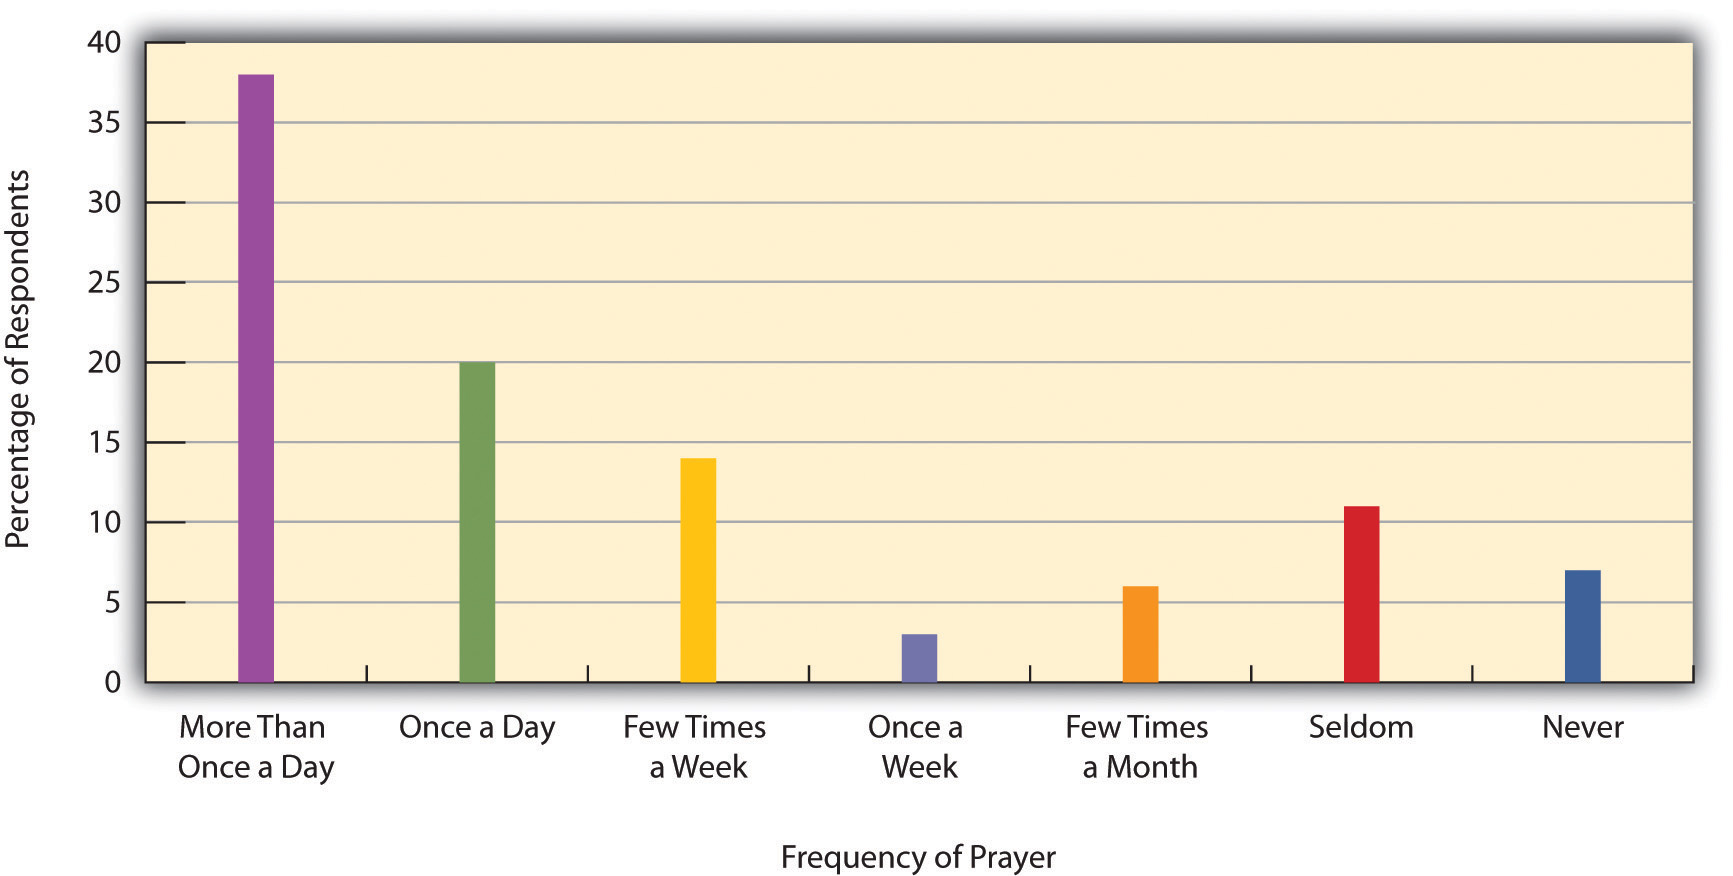 Frequency of Prayer